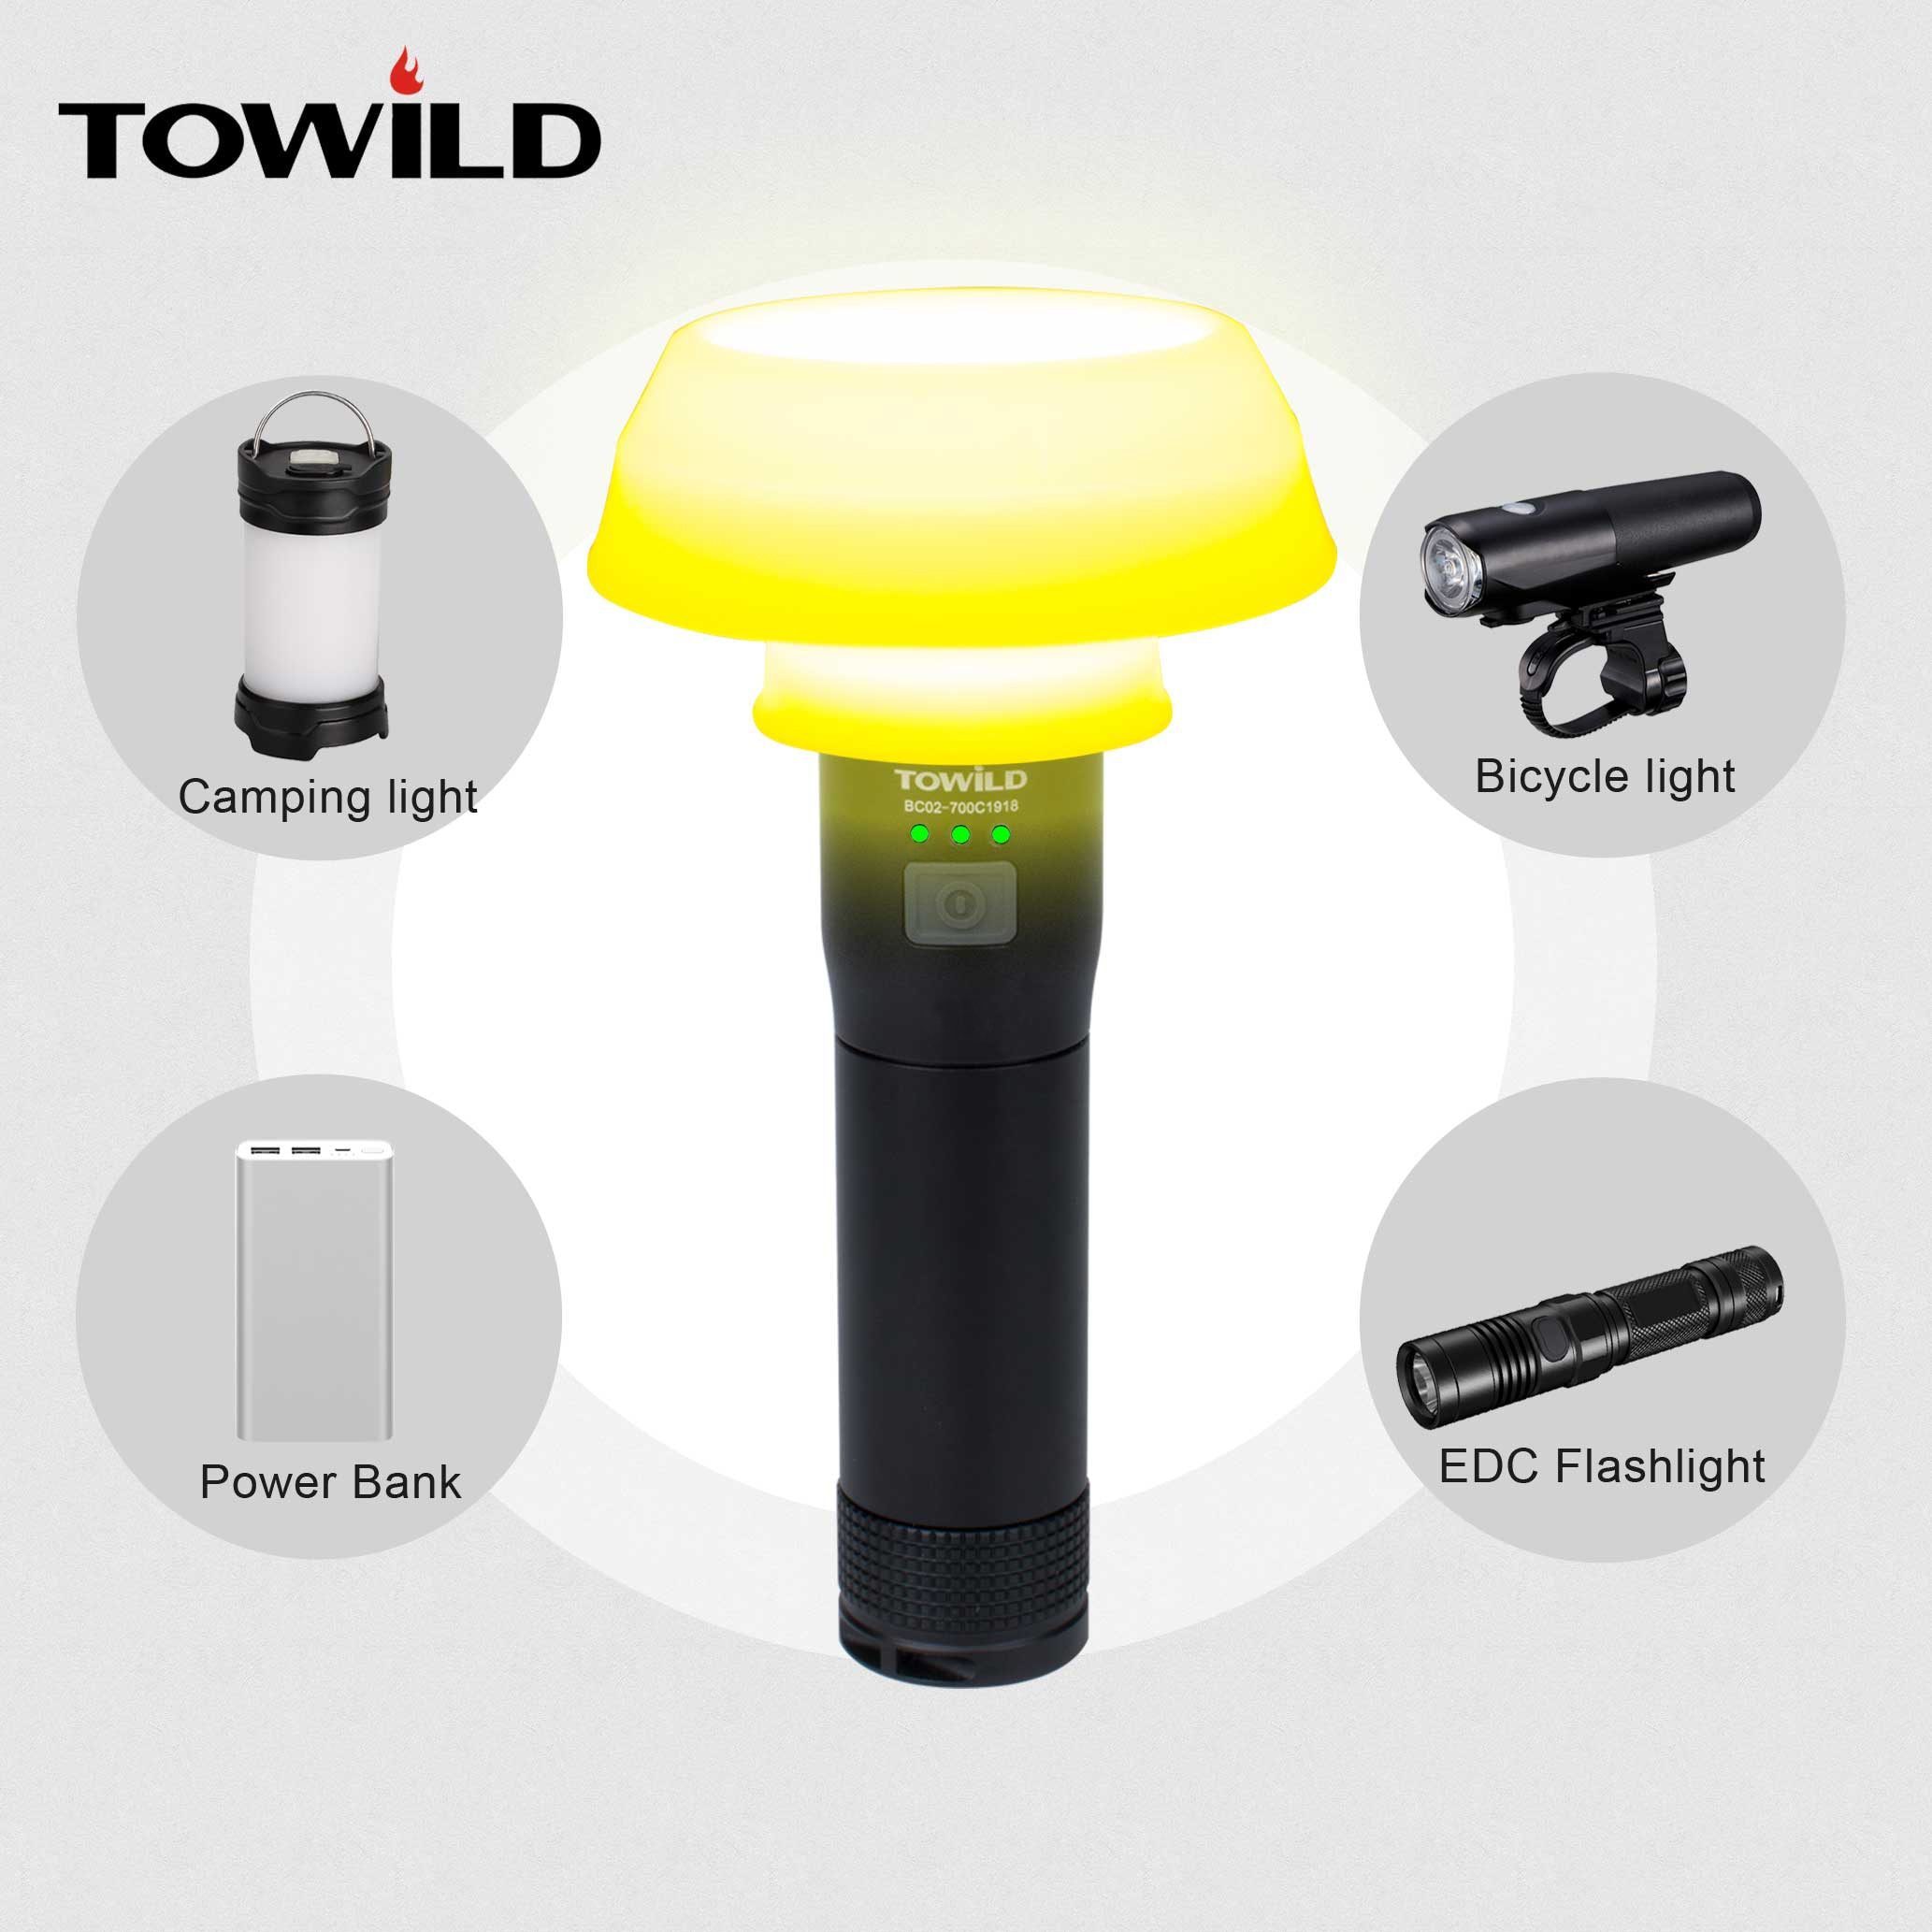 TOWILD-مصباح دراجة احترافي ، 700 لومن ، مصباح يدوي ، مصباح تخييم ، باور بانك ، كوب قابل للطي ، ملحقات الدراجة